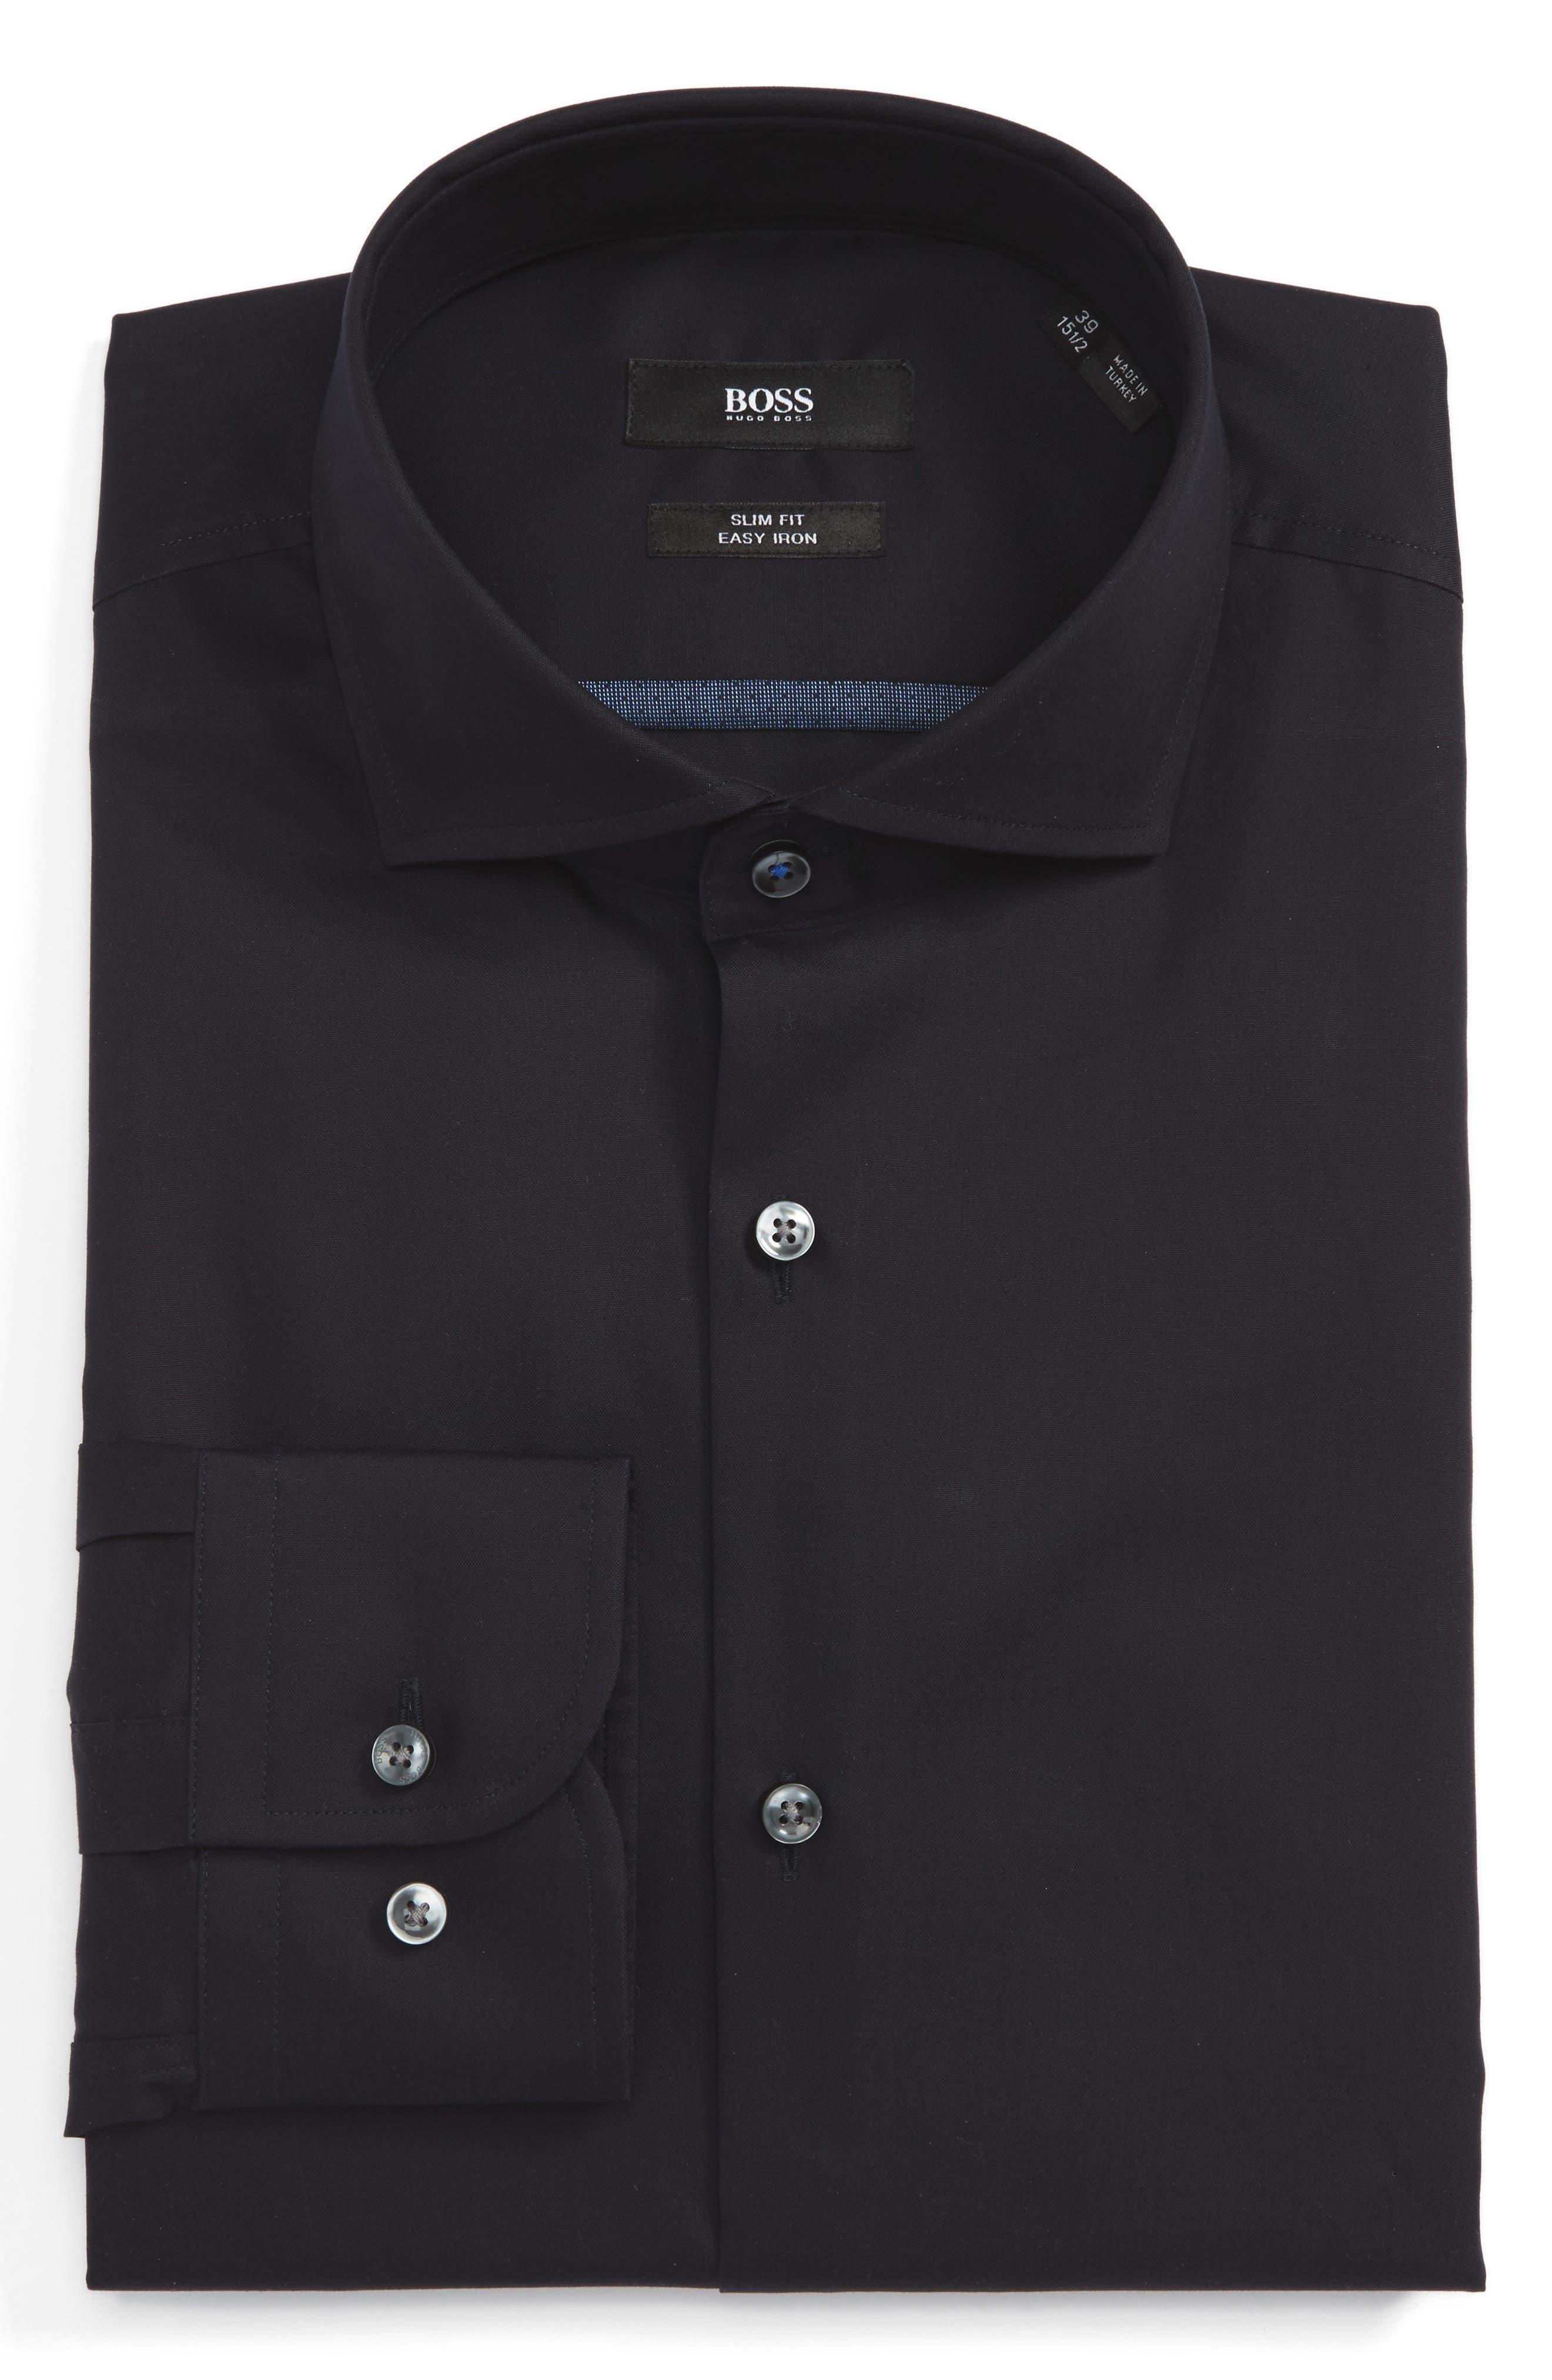 BOSS Slim Fit Easy Iron Solid Dress Shirt